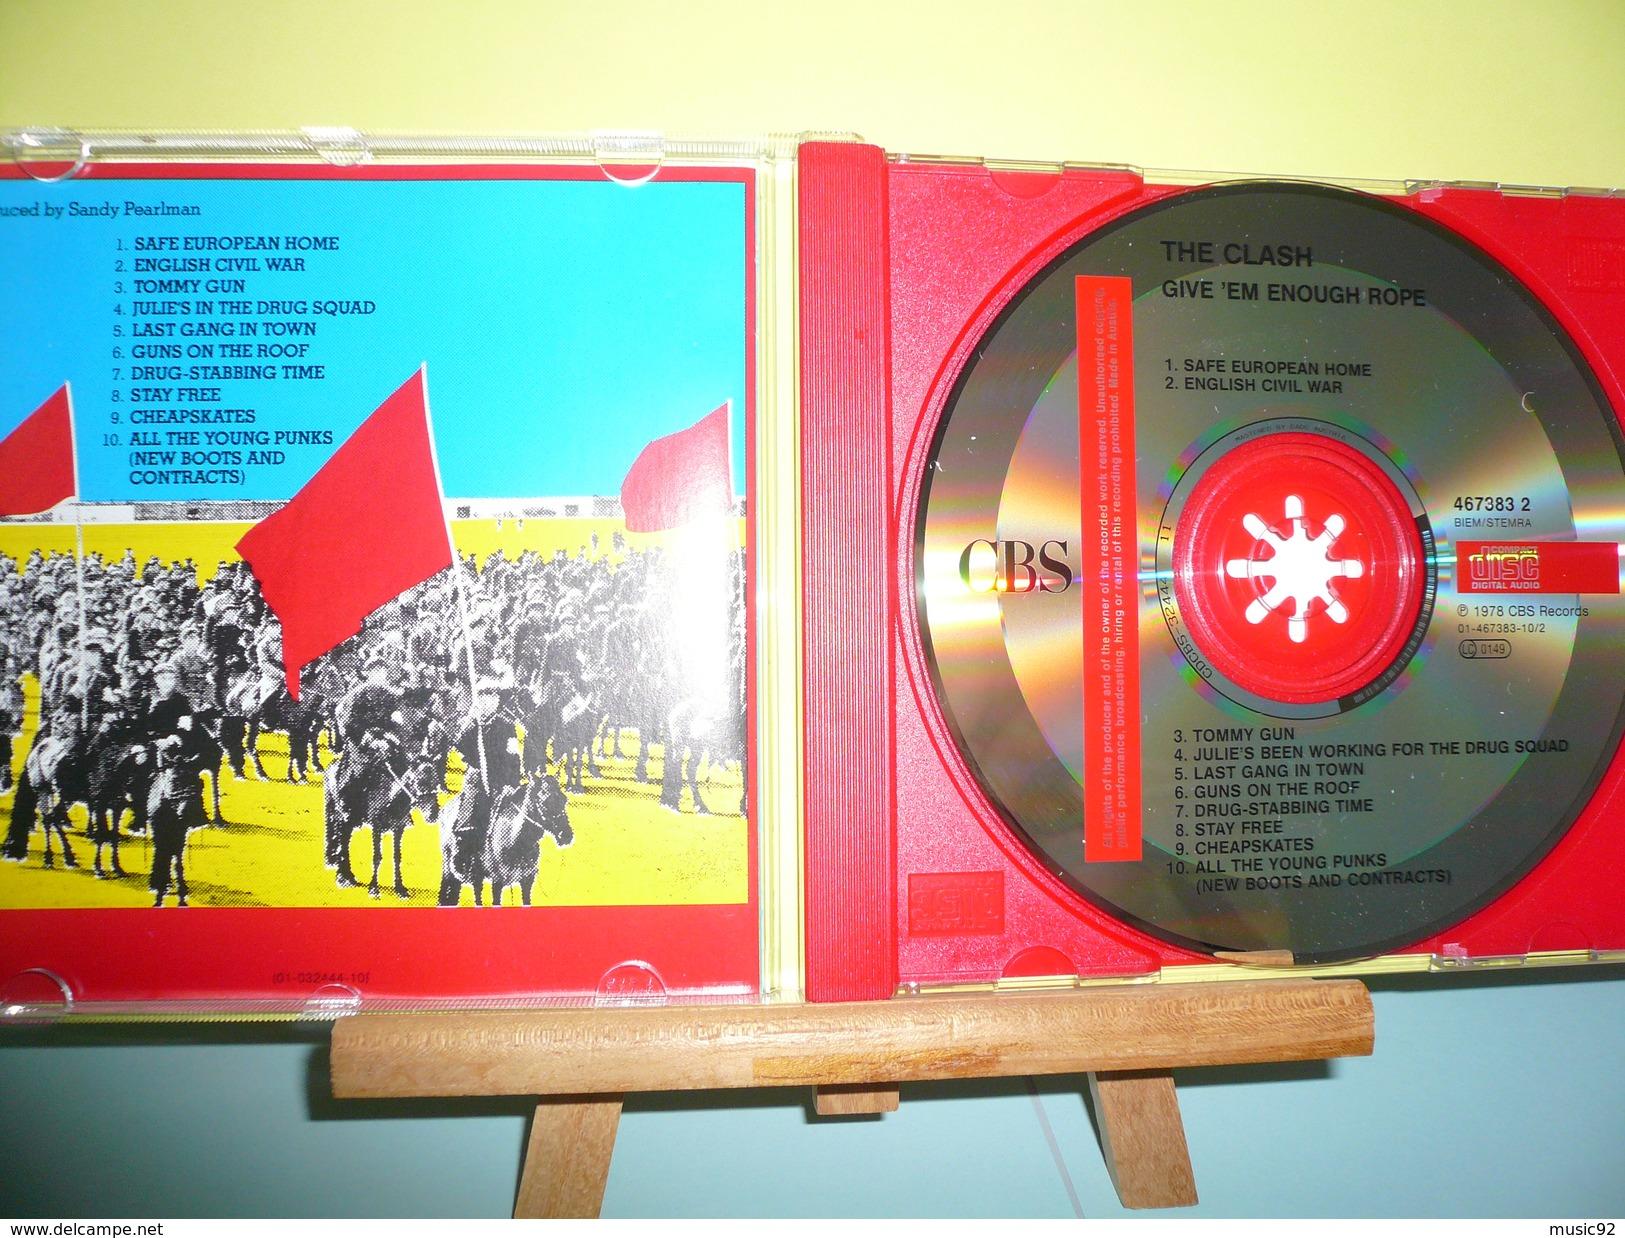 "THE CLASH""CD ALBUM"" GIVE 'EM ENOUGH ROPE"" - Rock"